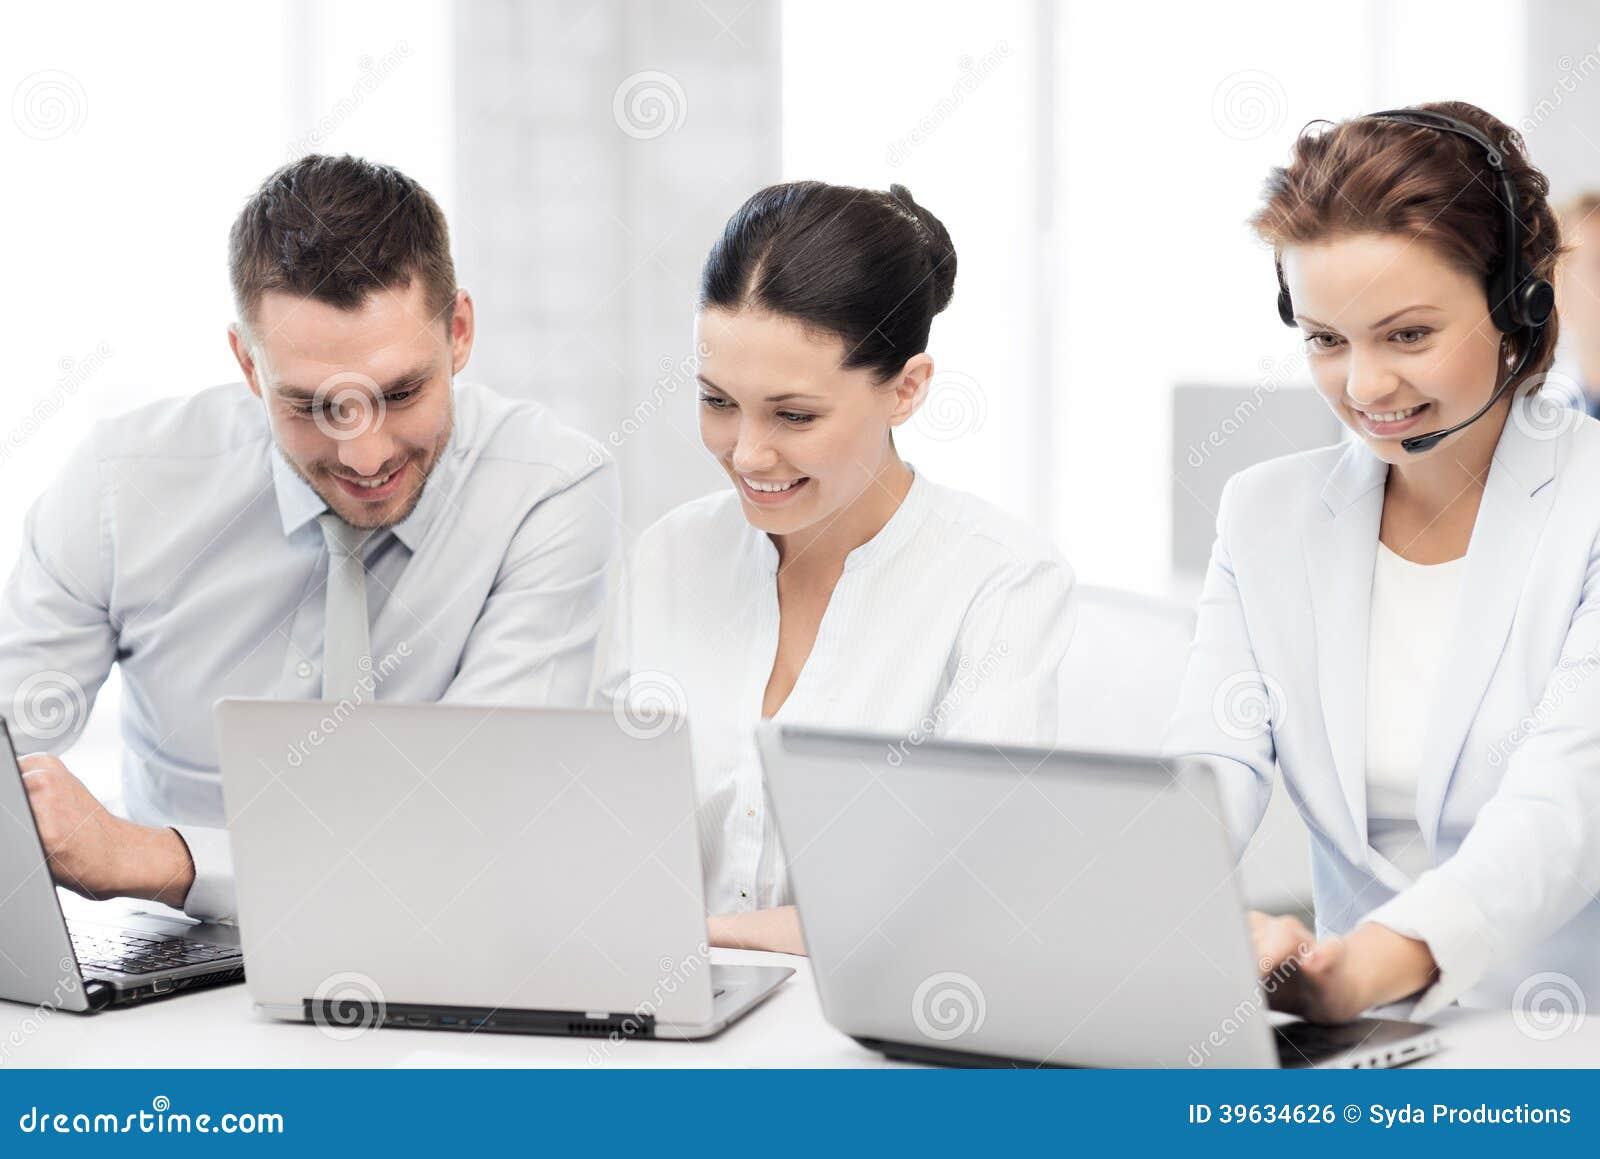 Groep die mensen met laptops in bureau werken